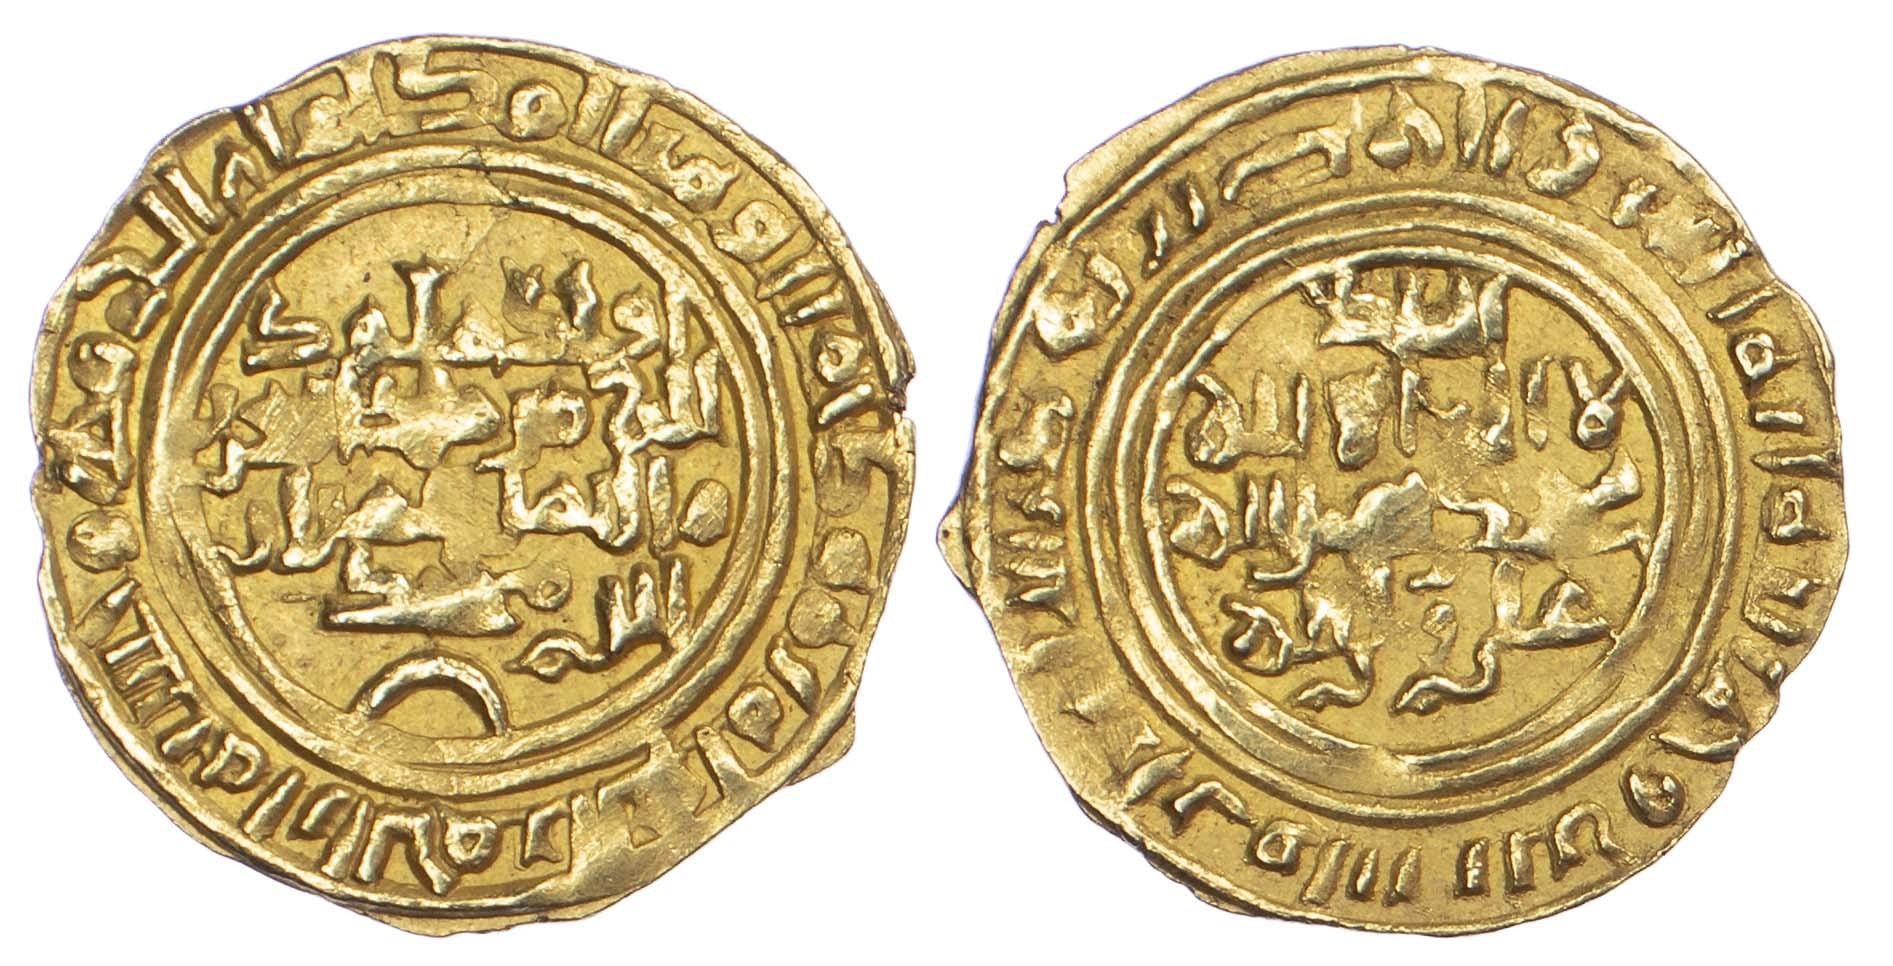 Zuray'id, Imran b. Muhammad, posthumous Gold Dinar (563h/1168 AD) - rare